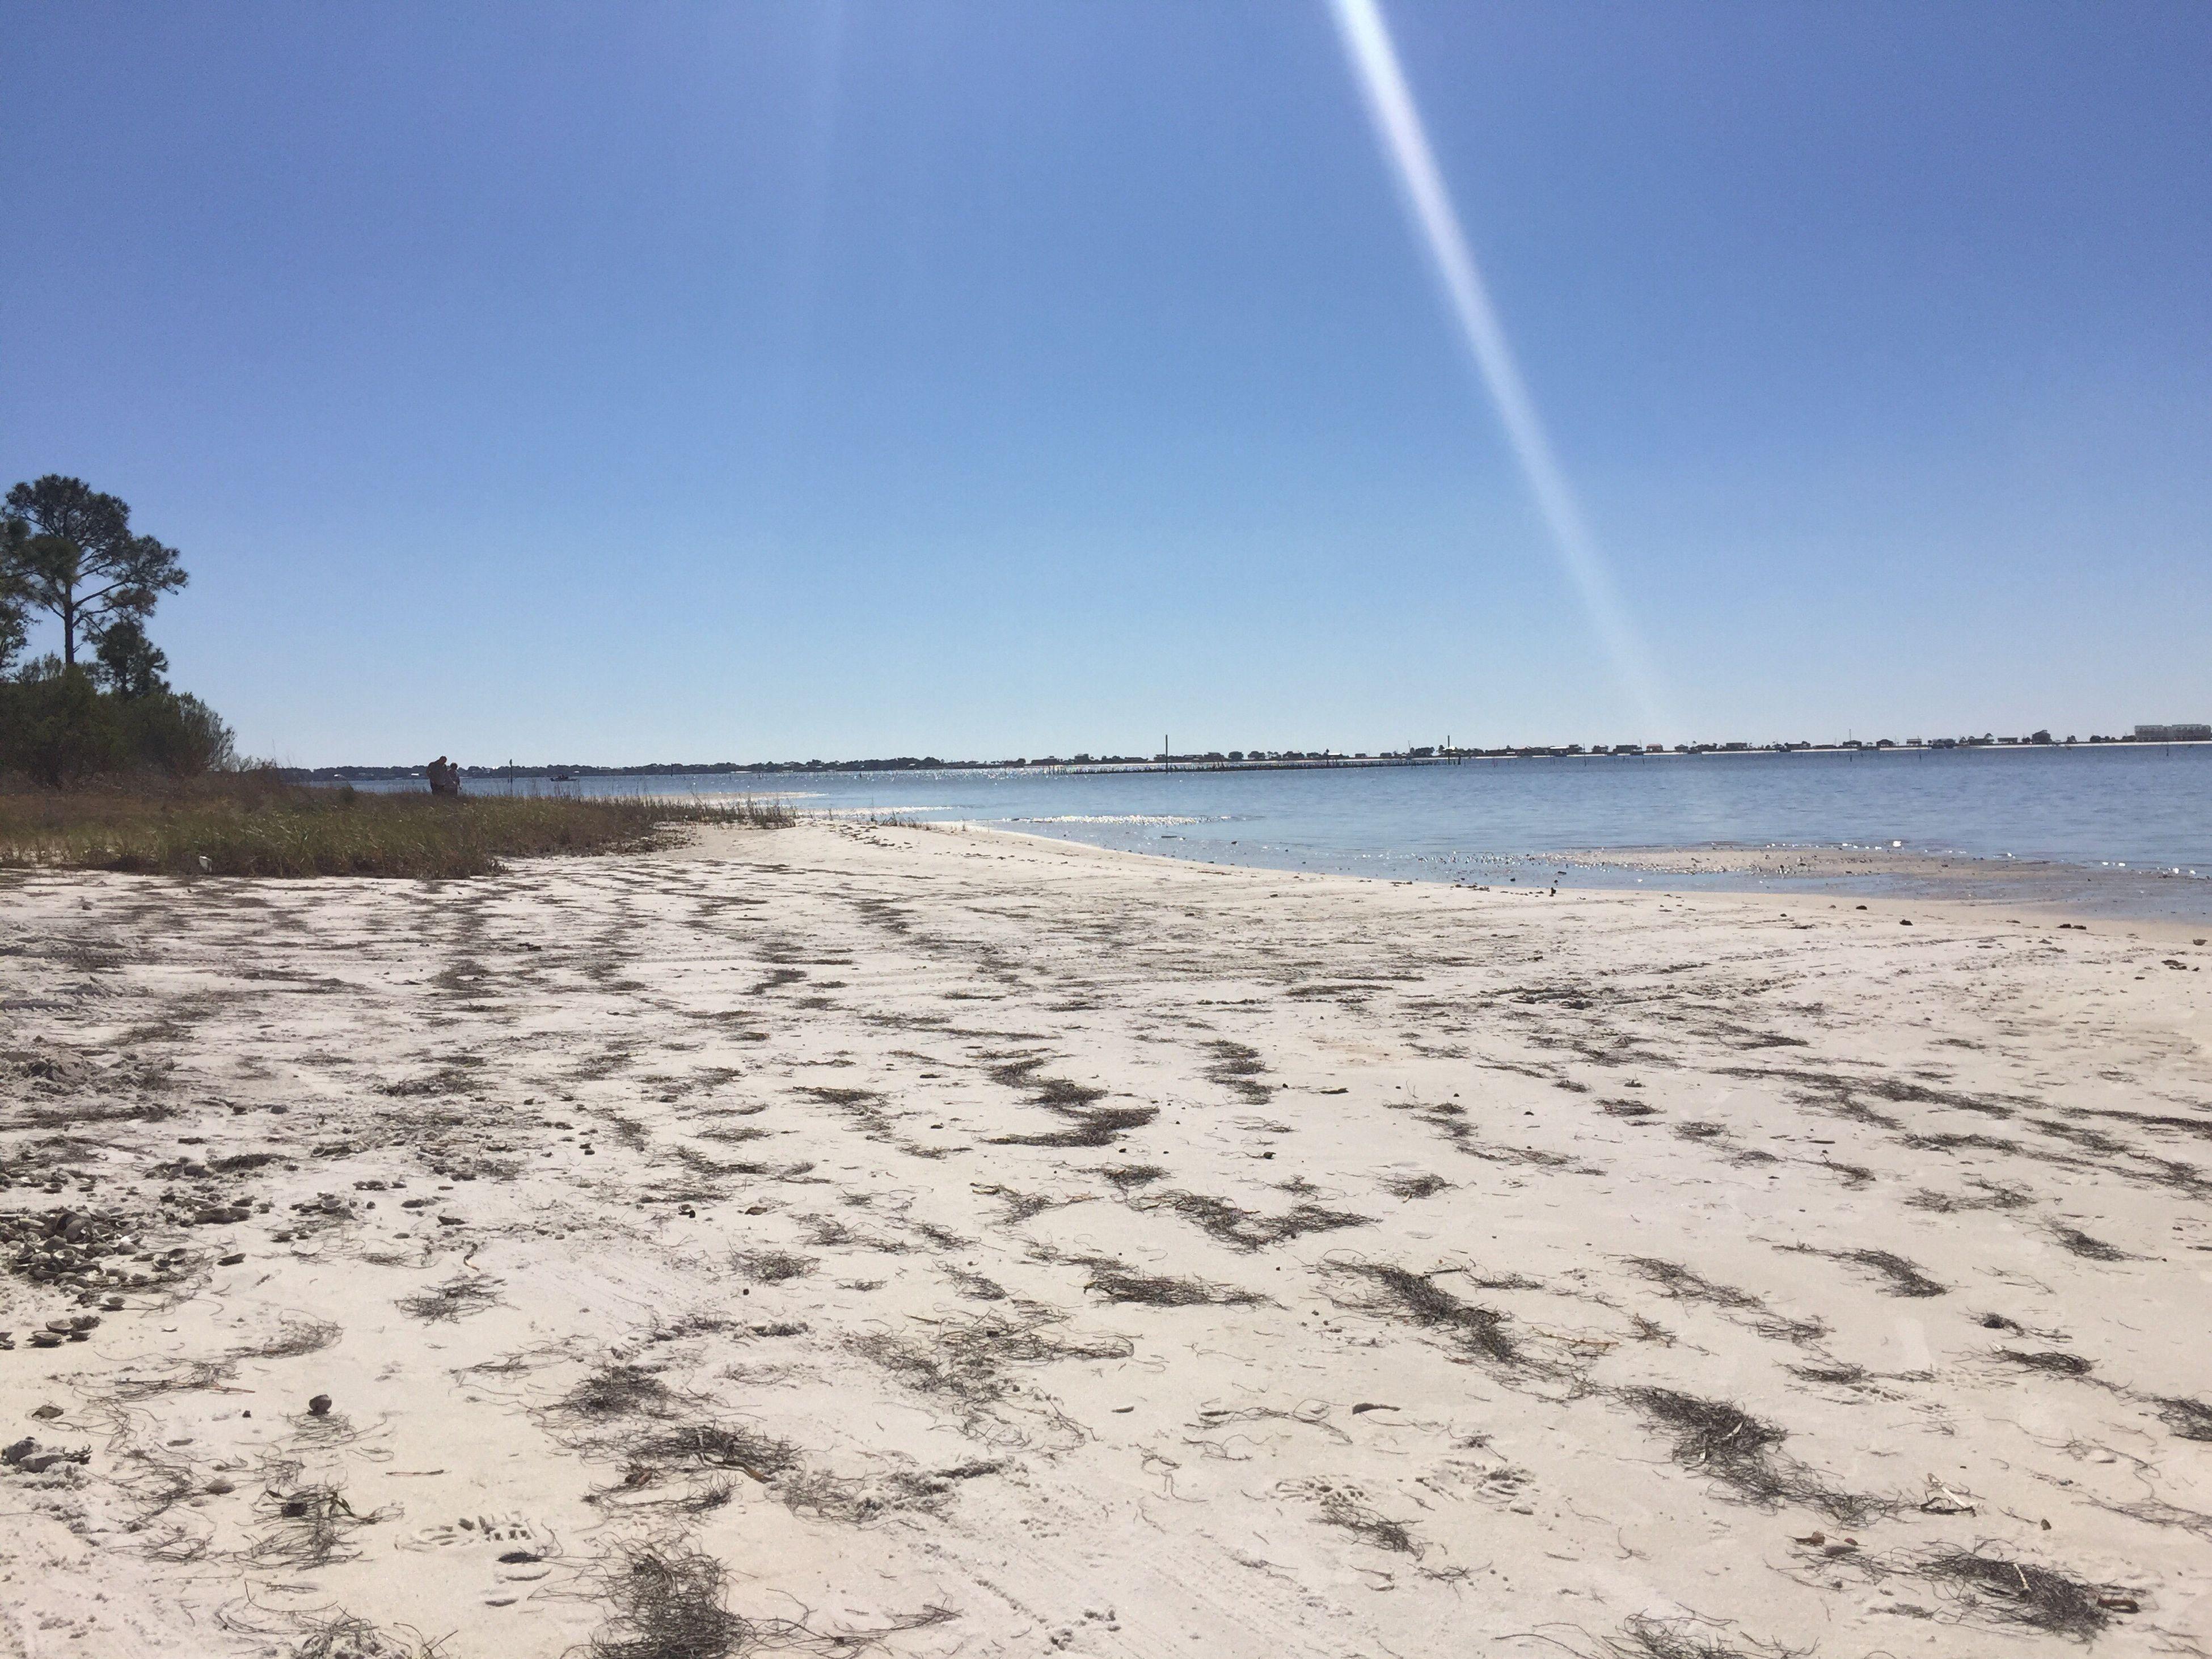 beach, tranquility, tranquil scene, scenics, water, clear sky, blue, sand, beauty in nature, sea, shore, sunlight, nature, sun, sunbeam, horizon over water, copy space, idyllic, sunny, sky